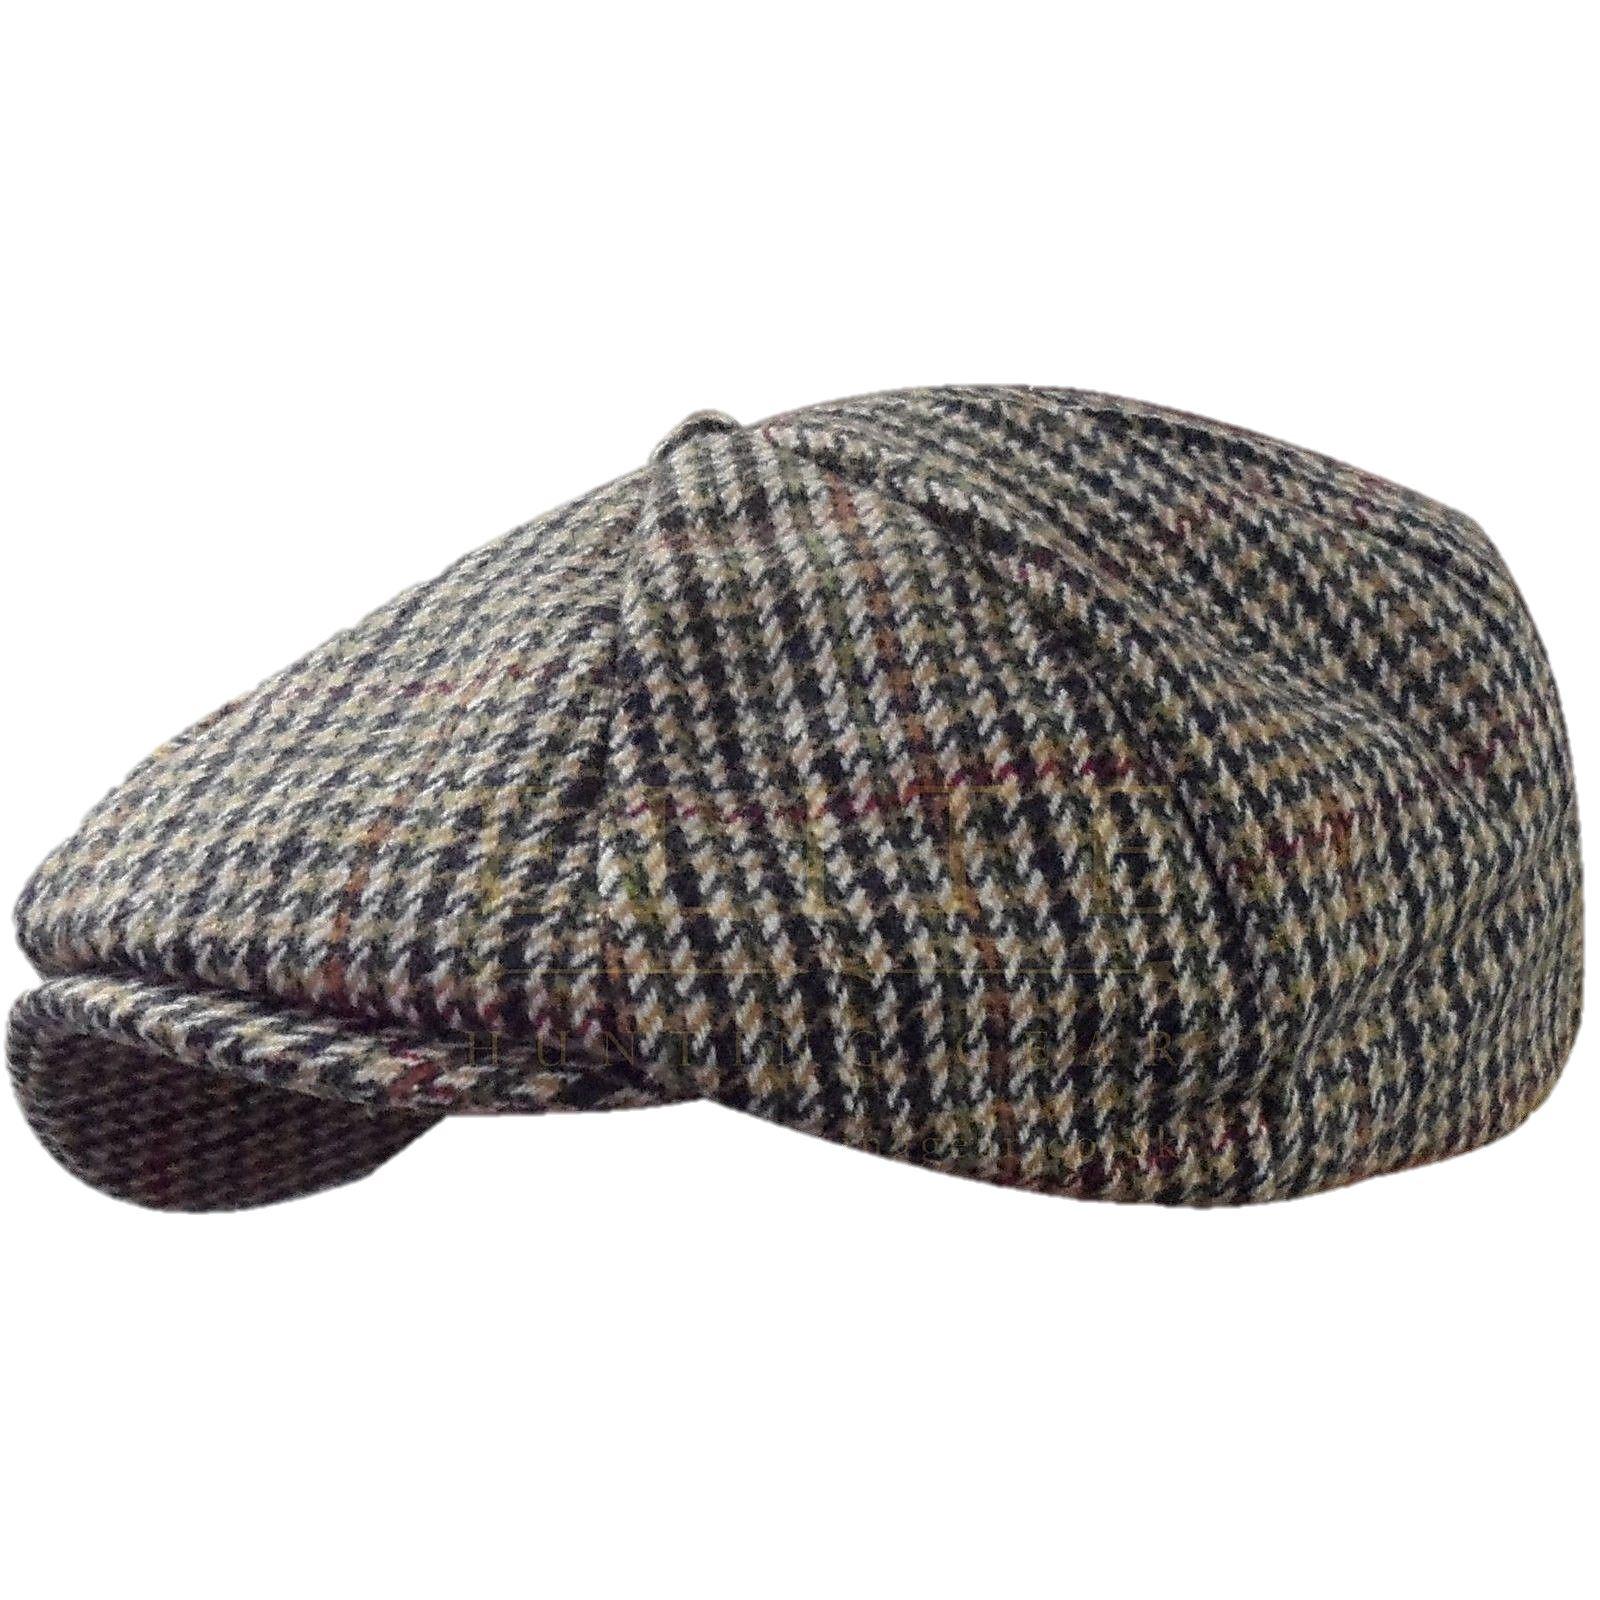 Tweed Hat Flat Cap Wool Country Gatsby Baker Boy 8 Panel Ebay